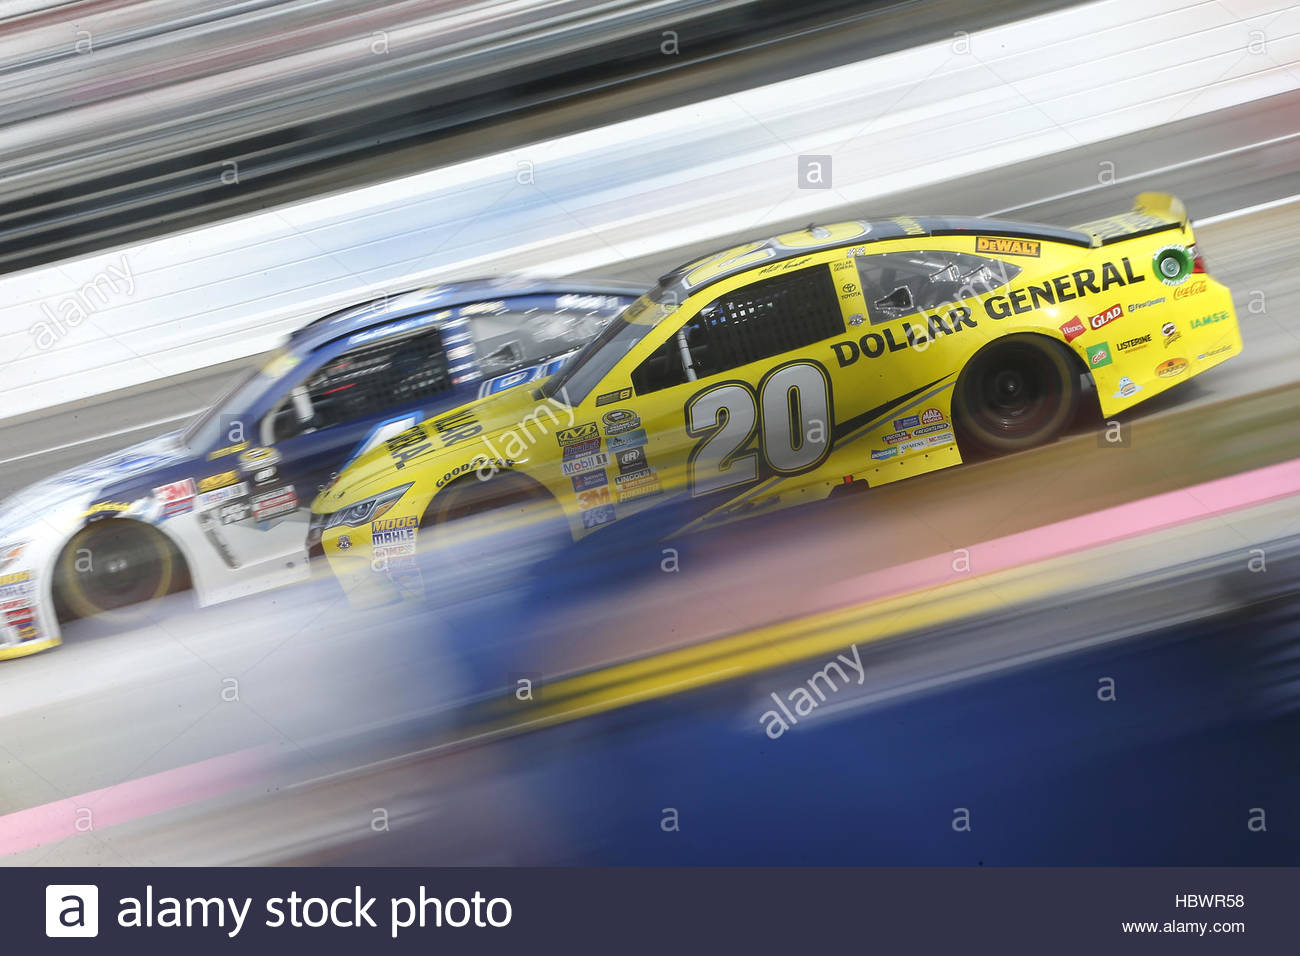 NASCAR: 30 Okt. Goody schnelle Linderung 500 Stockbild